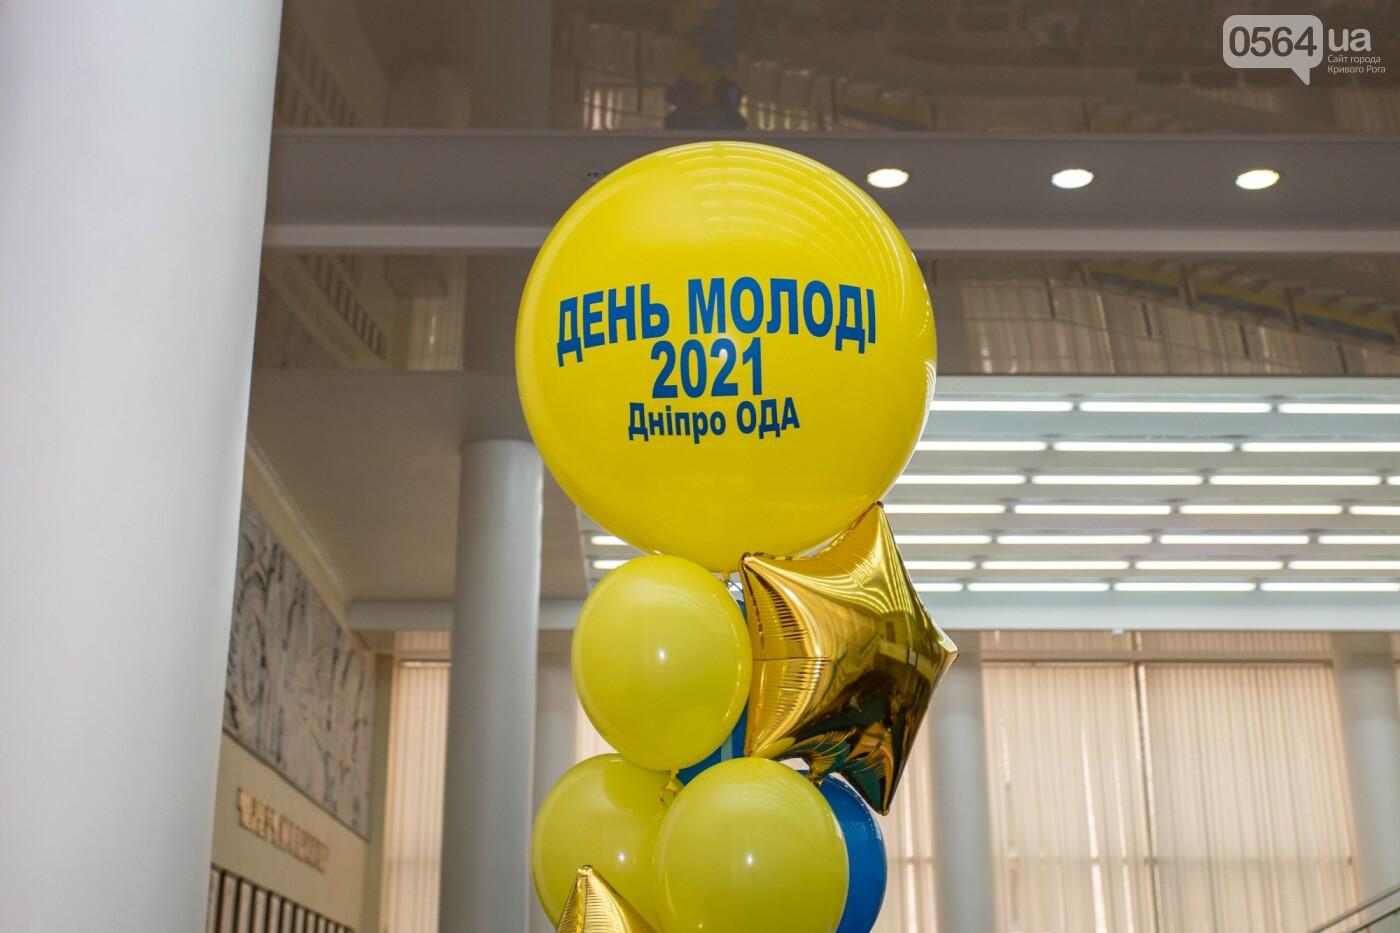 Молодым активистам Днепропетровщины вручили отличия и подарки, - ФОТО , фото-5